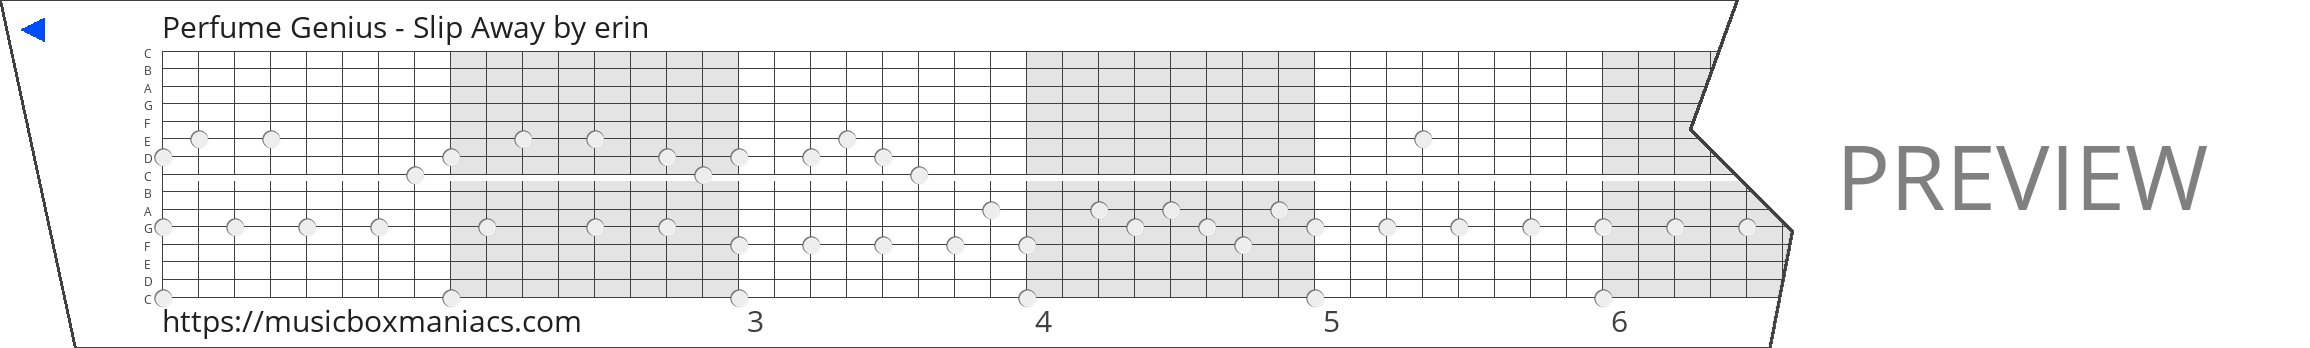 Perfume Genius - Slip Away 15 note music box paper strip